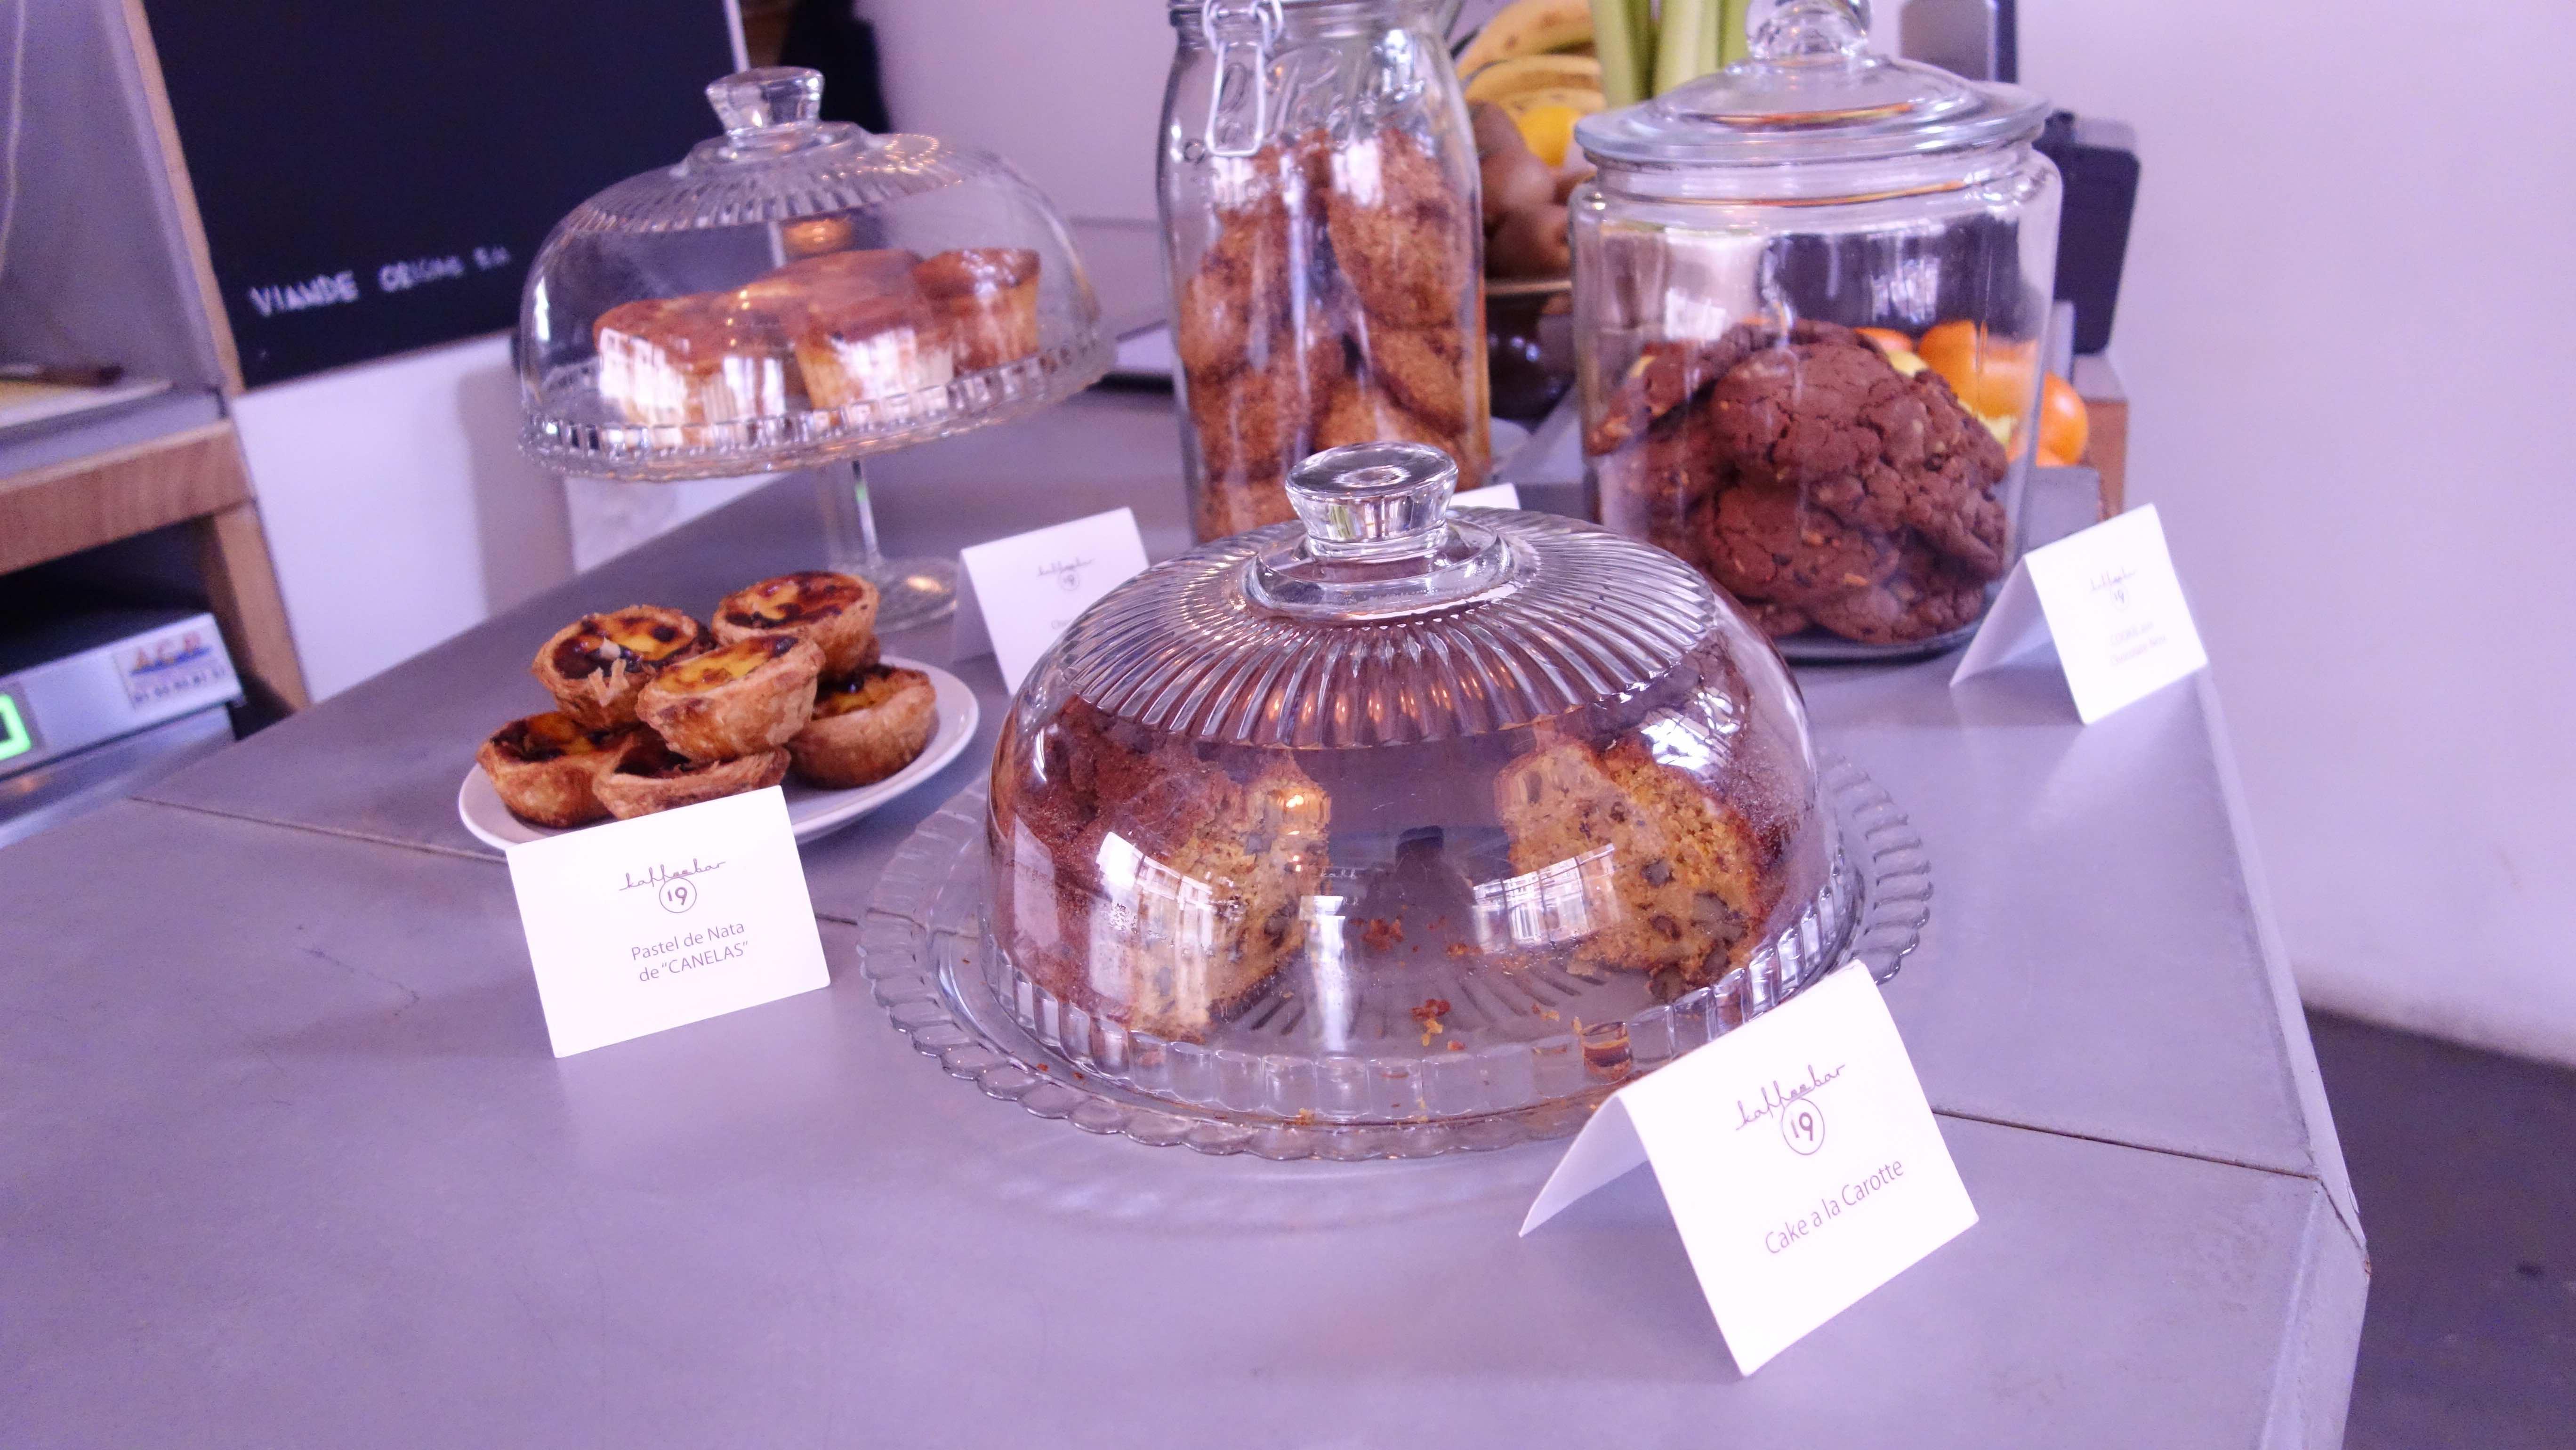 food in paris pastries 75019